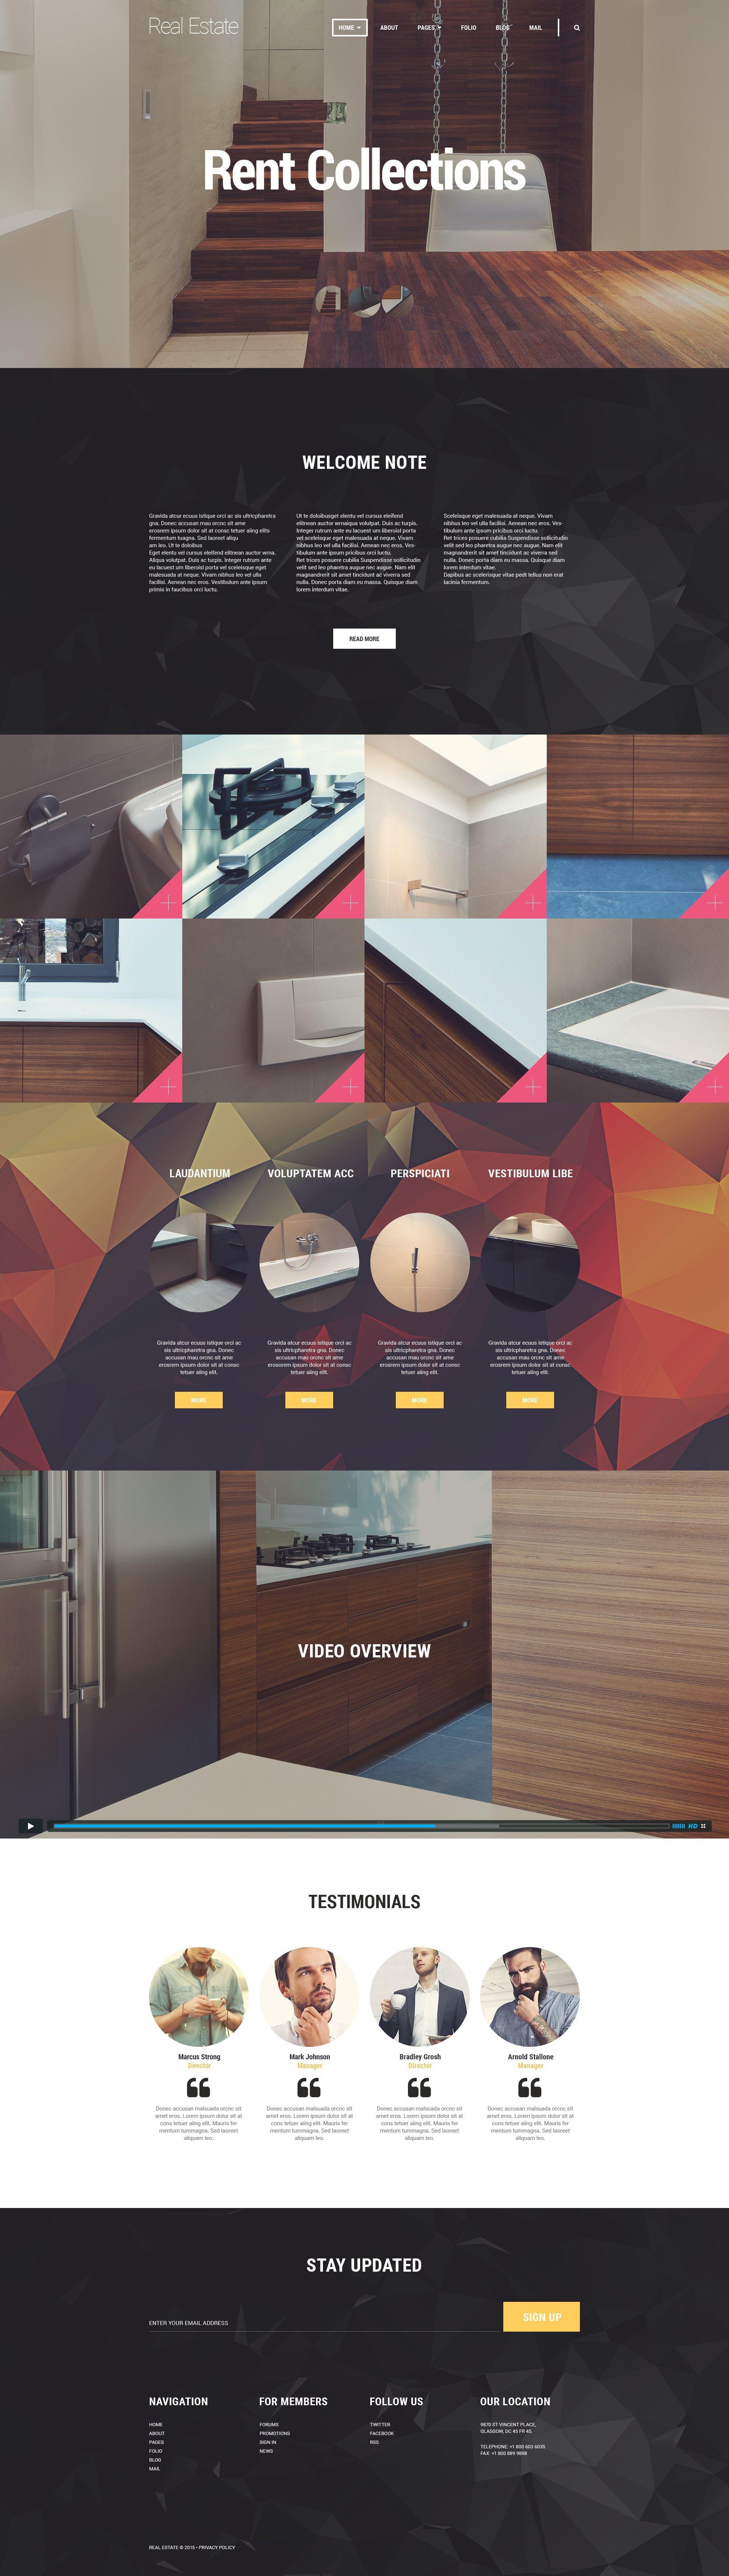 Property Selector Joomla Template - screenshot